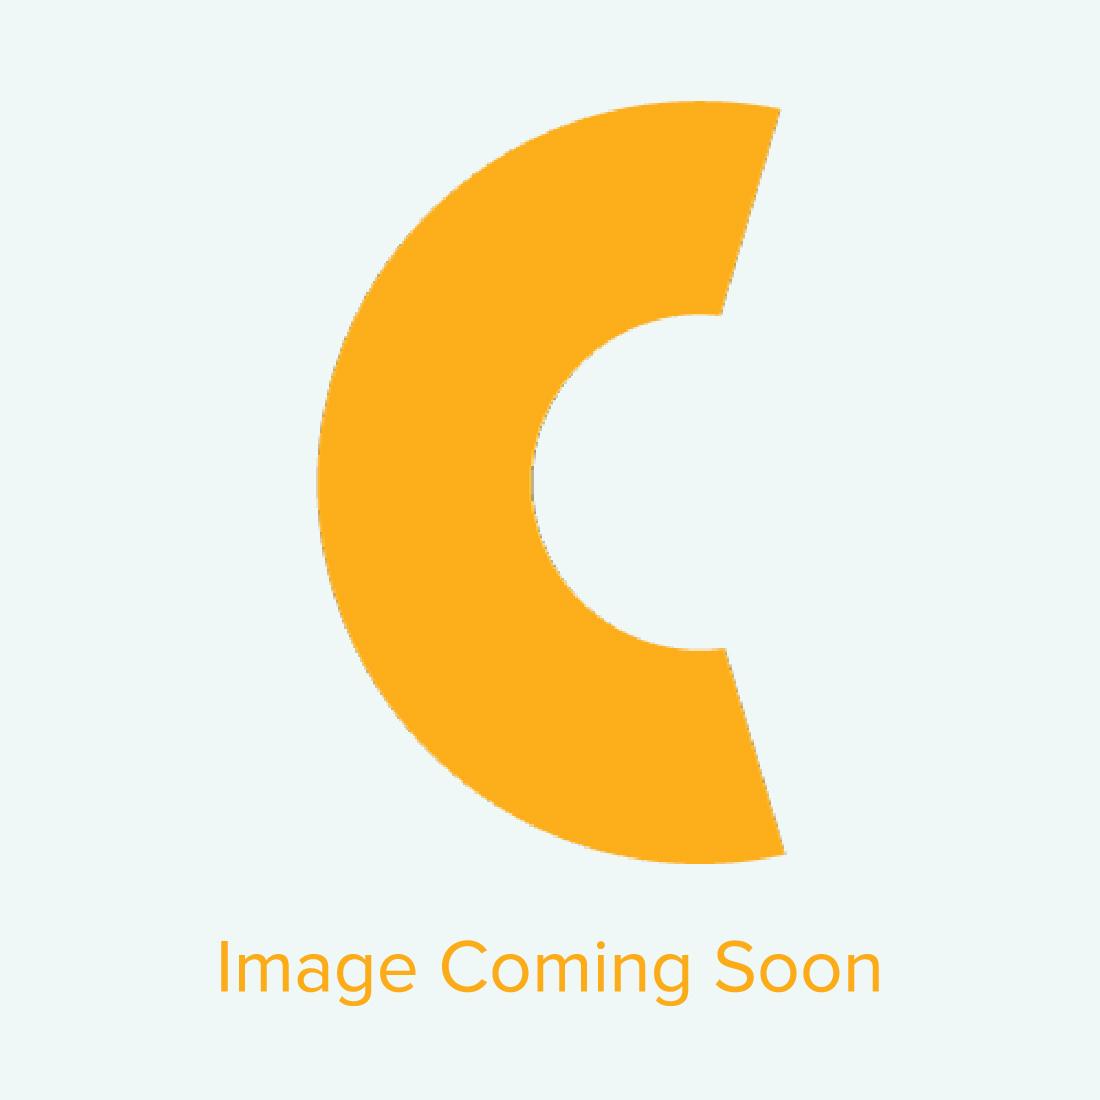 Epson C120 - ChromaBlast Quick Connect Kit